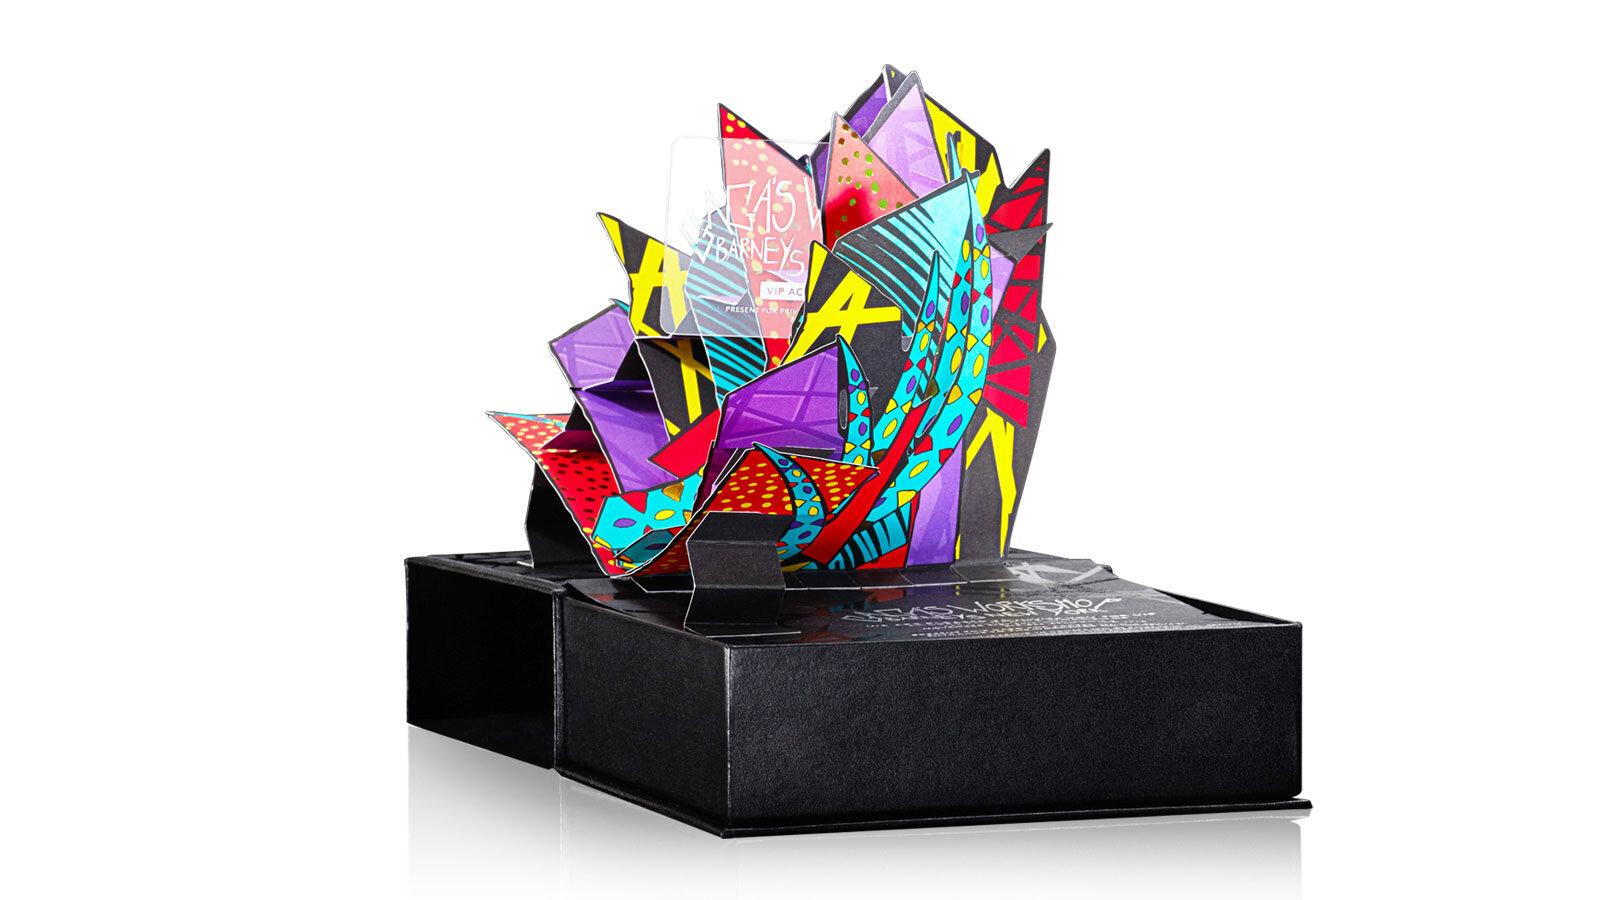 Barneys-New-York-Lady-Gaga-Design-Packaging-4.JPG